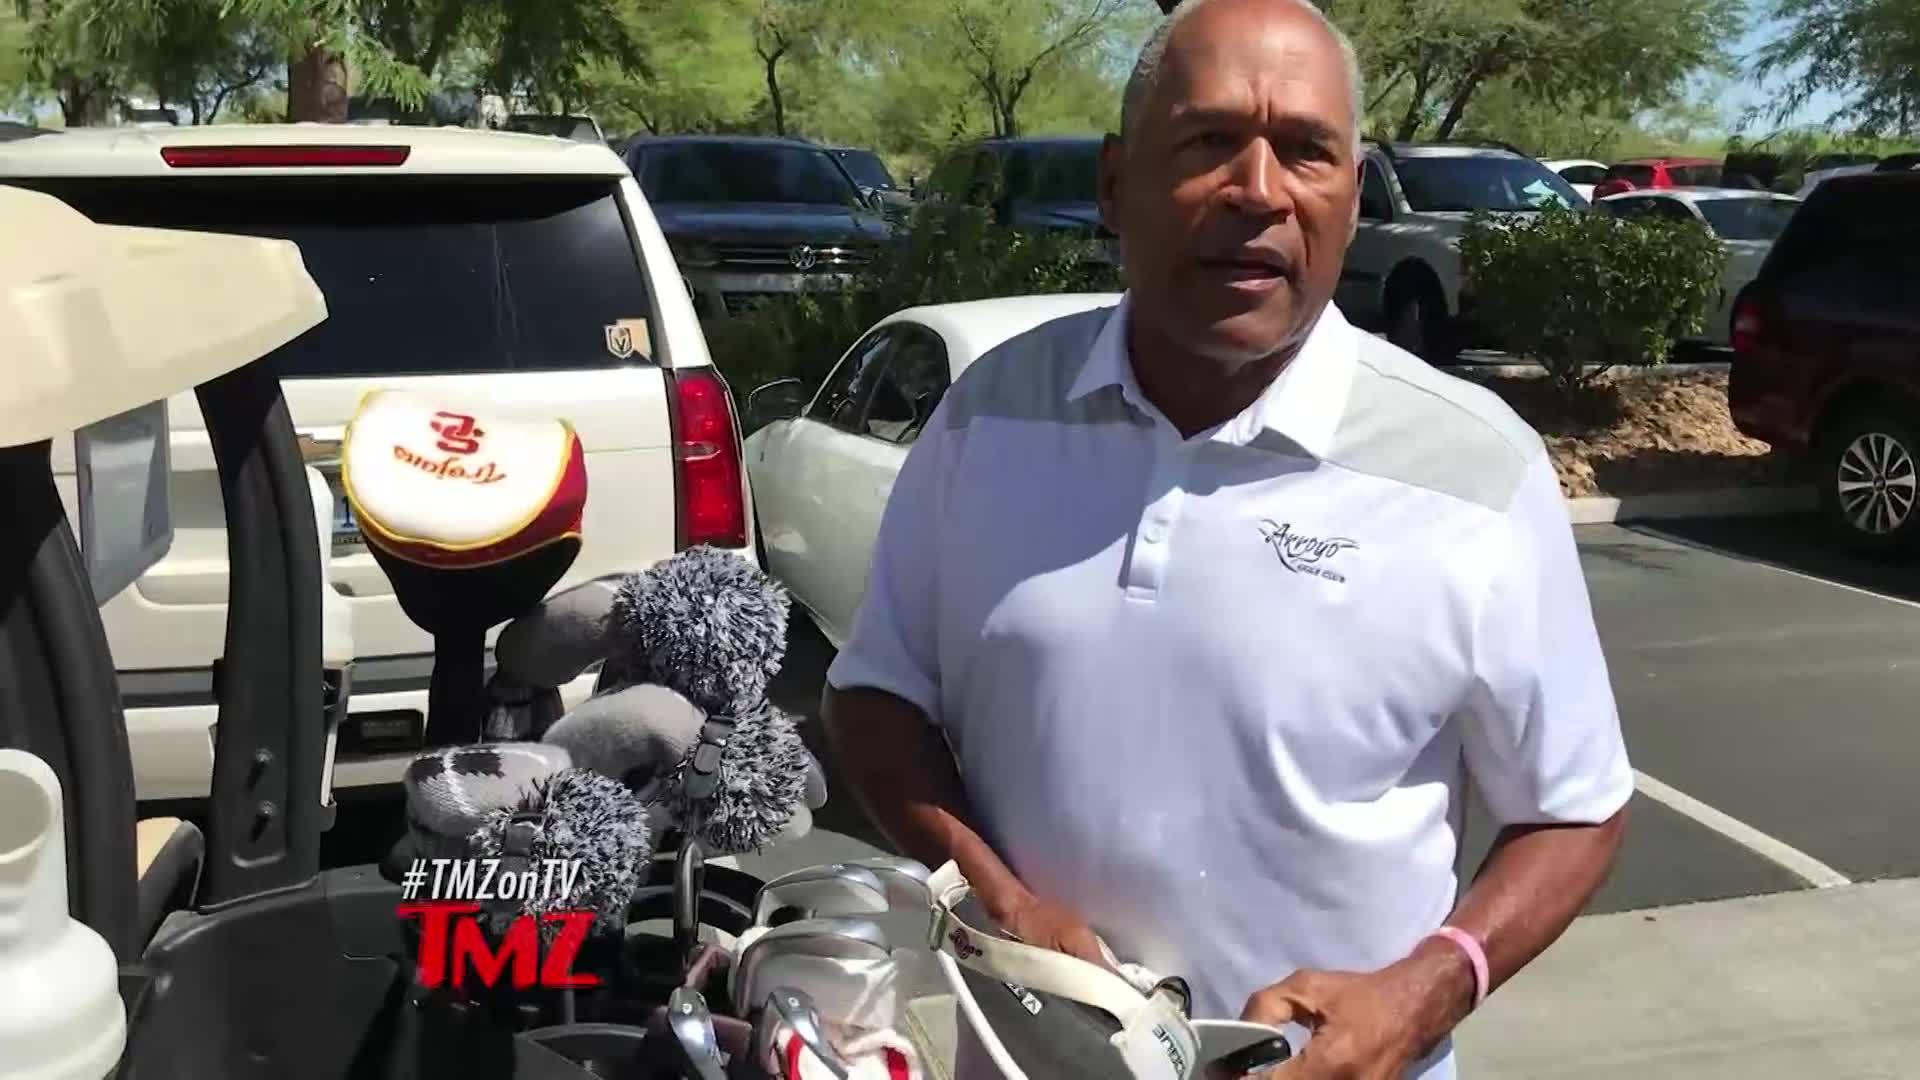 TMZ LIVE on Demand: Bill Cosby